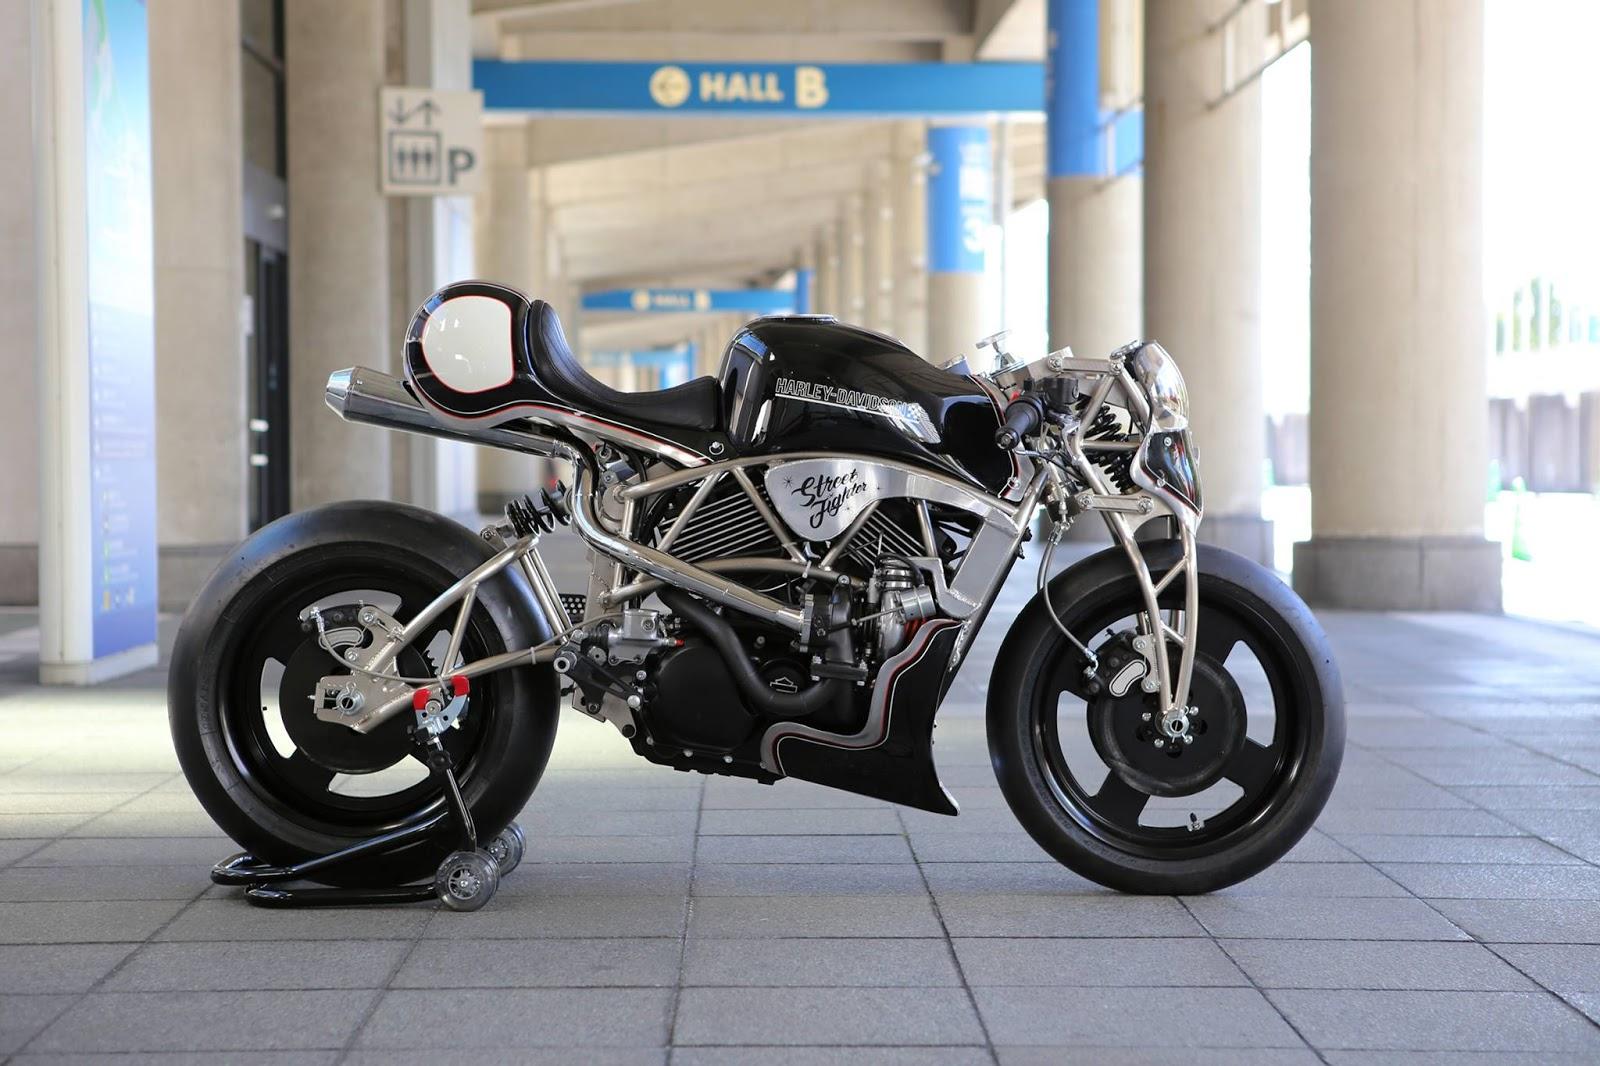 Harley Davidson XG 750 Turbo Street Fighter